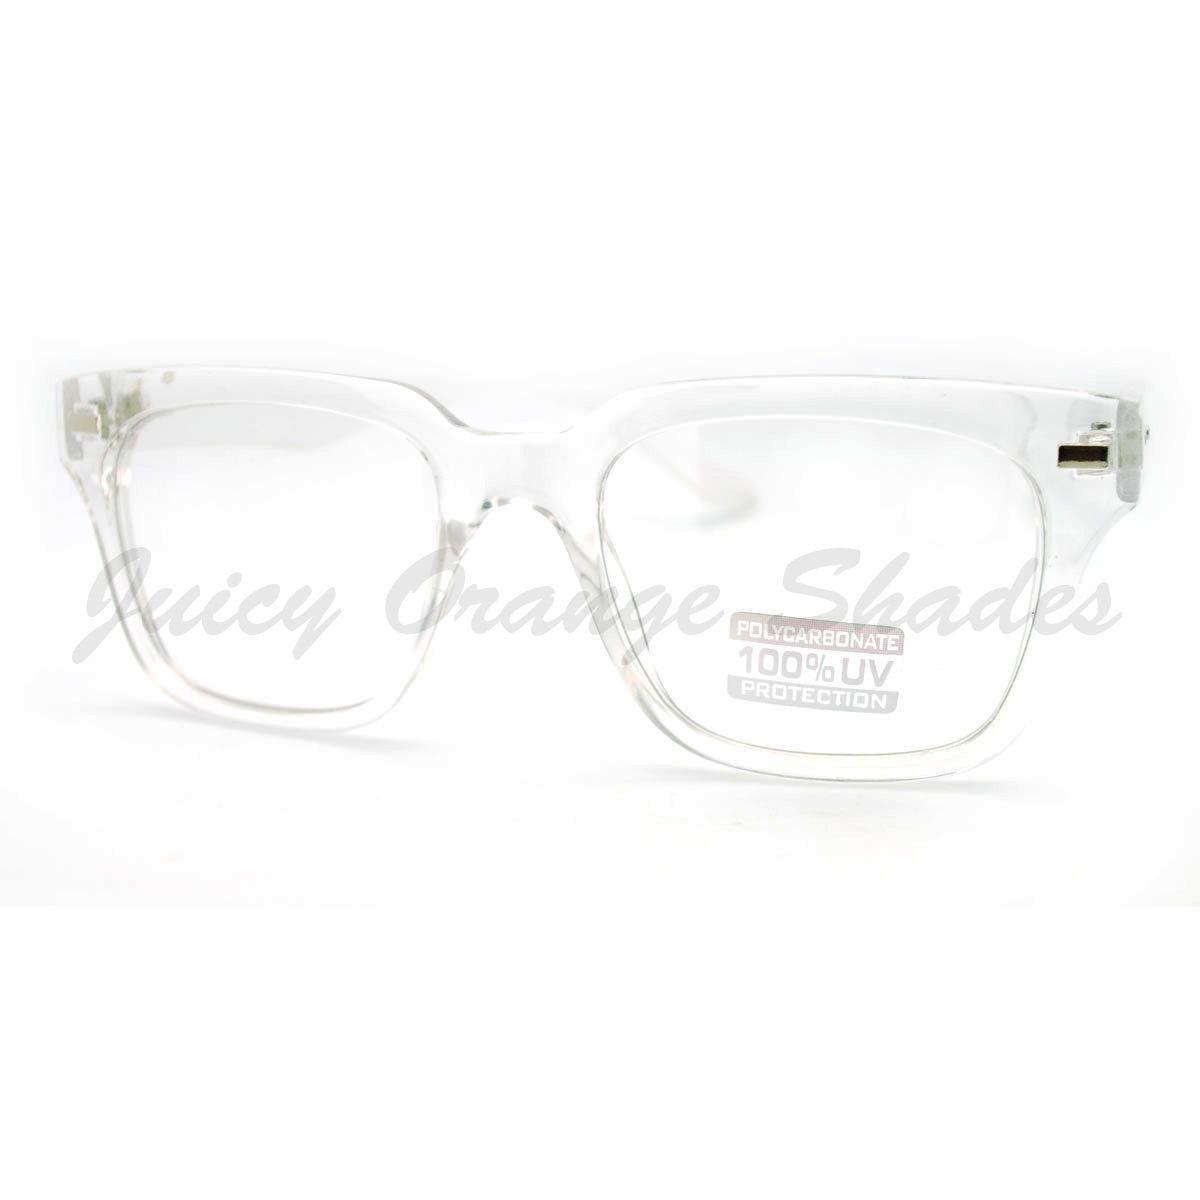 Square Eyeglasses Optical Frame Clear Lens Fashion Glasses